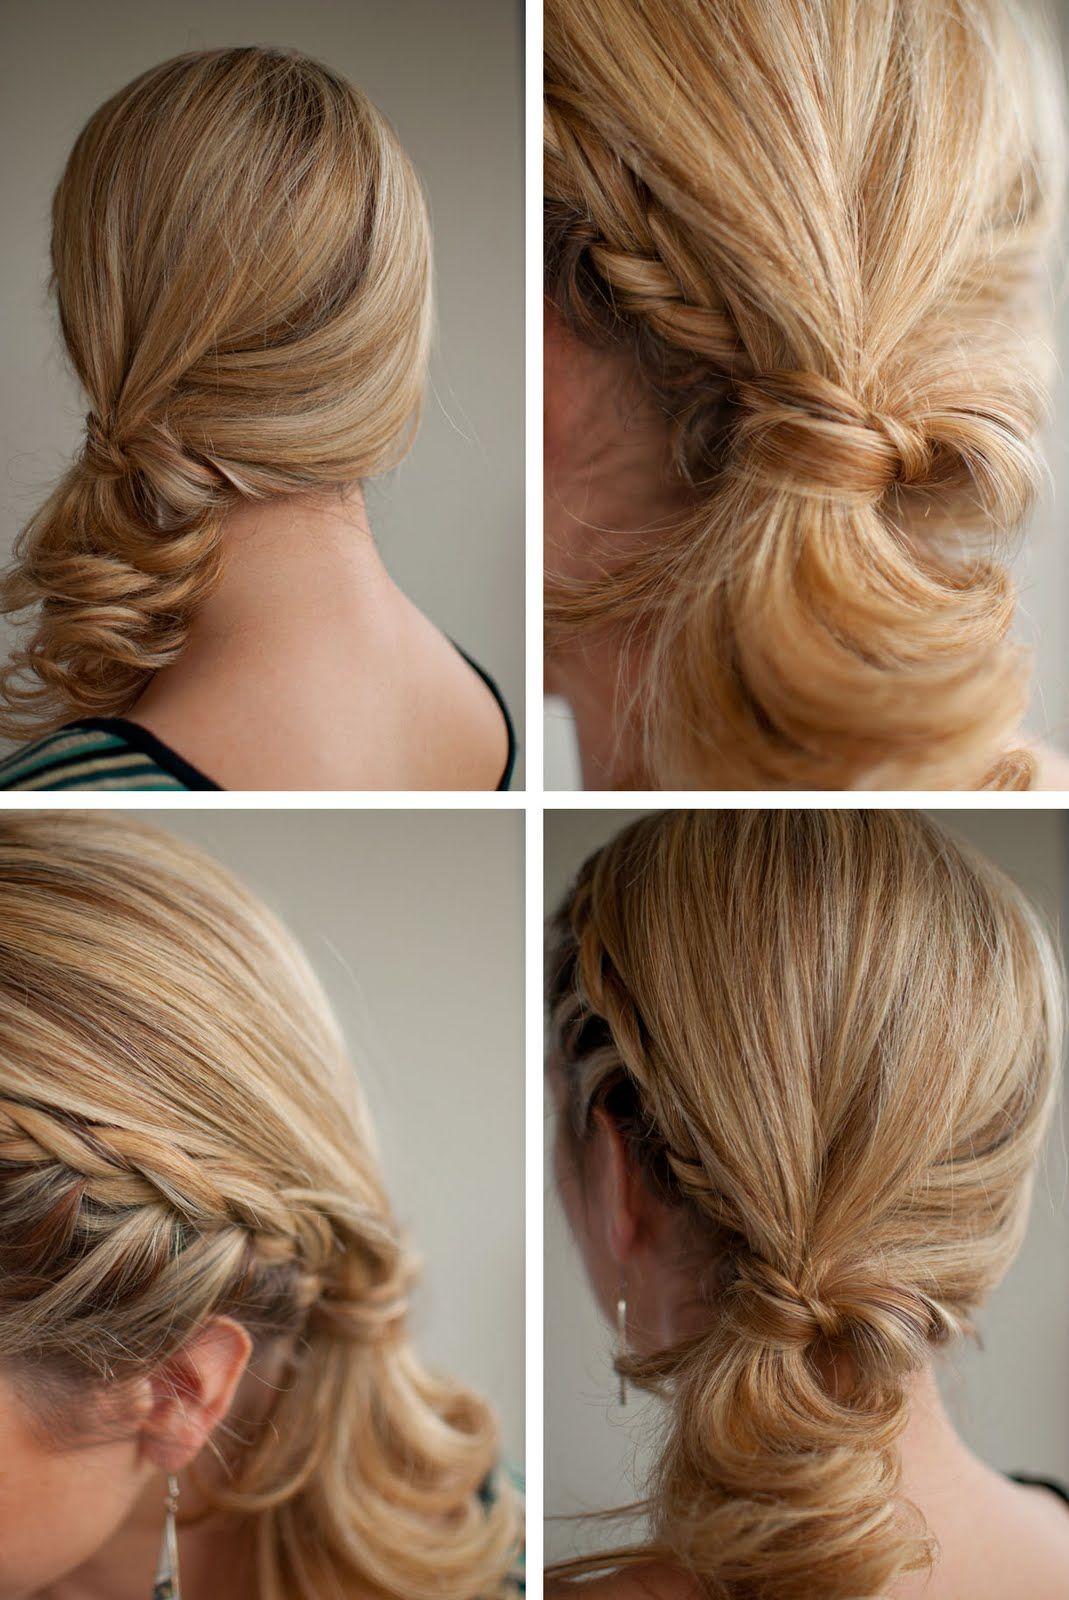 Ponytails nails pinterest ponytail braided pony and hair style